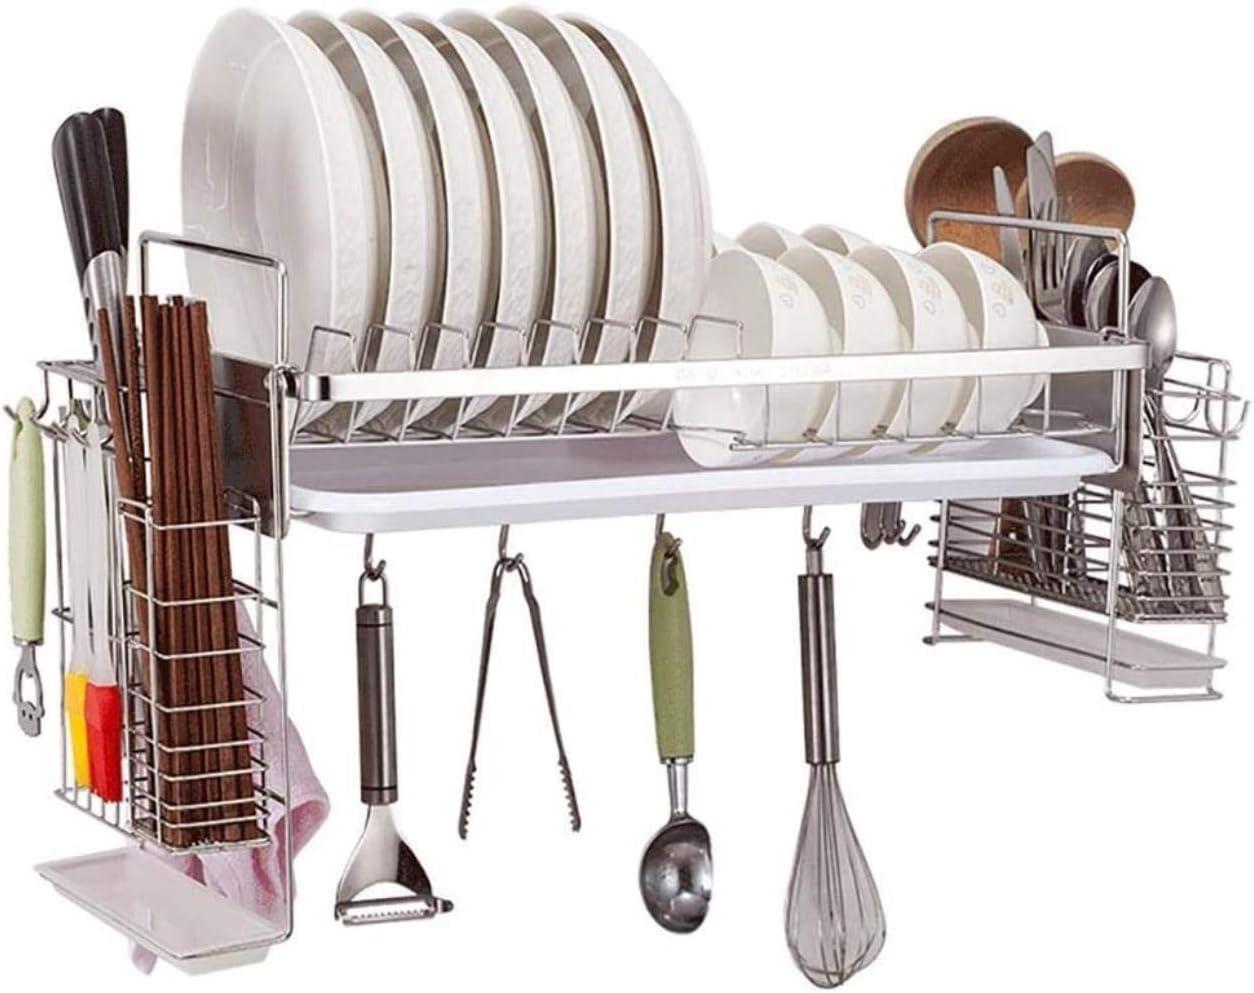 LSZ Wall Shelves for Kitchen Organize Cooking Utensils Hooks Surprise price Sales sale